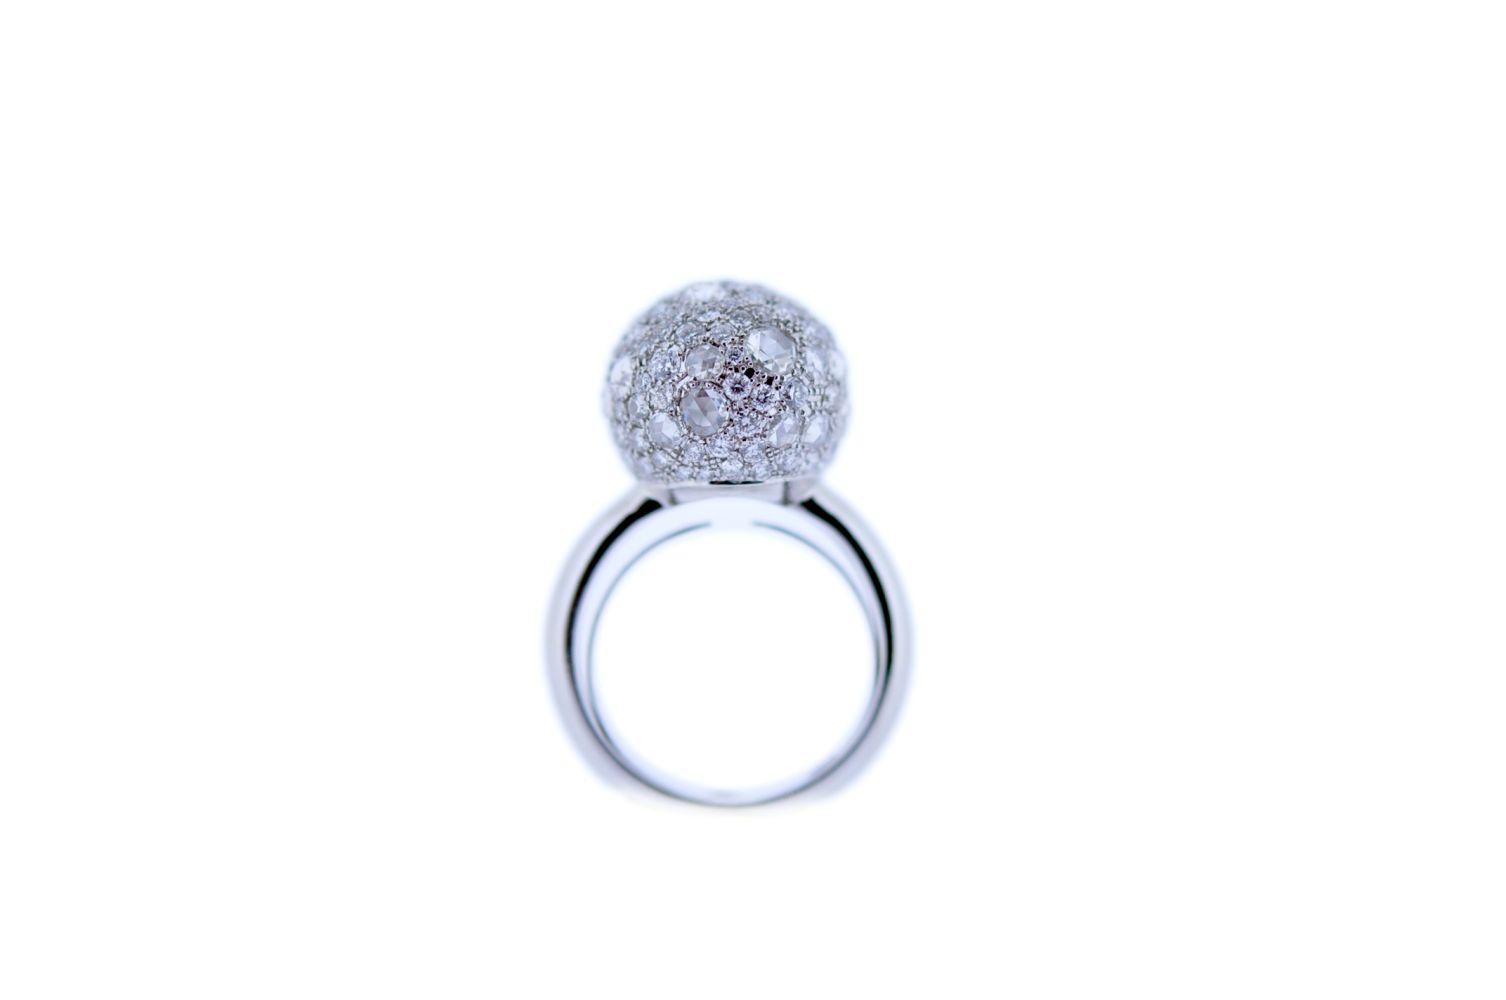 #31 Brilliant Ring | Brillantring Image